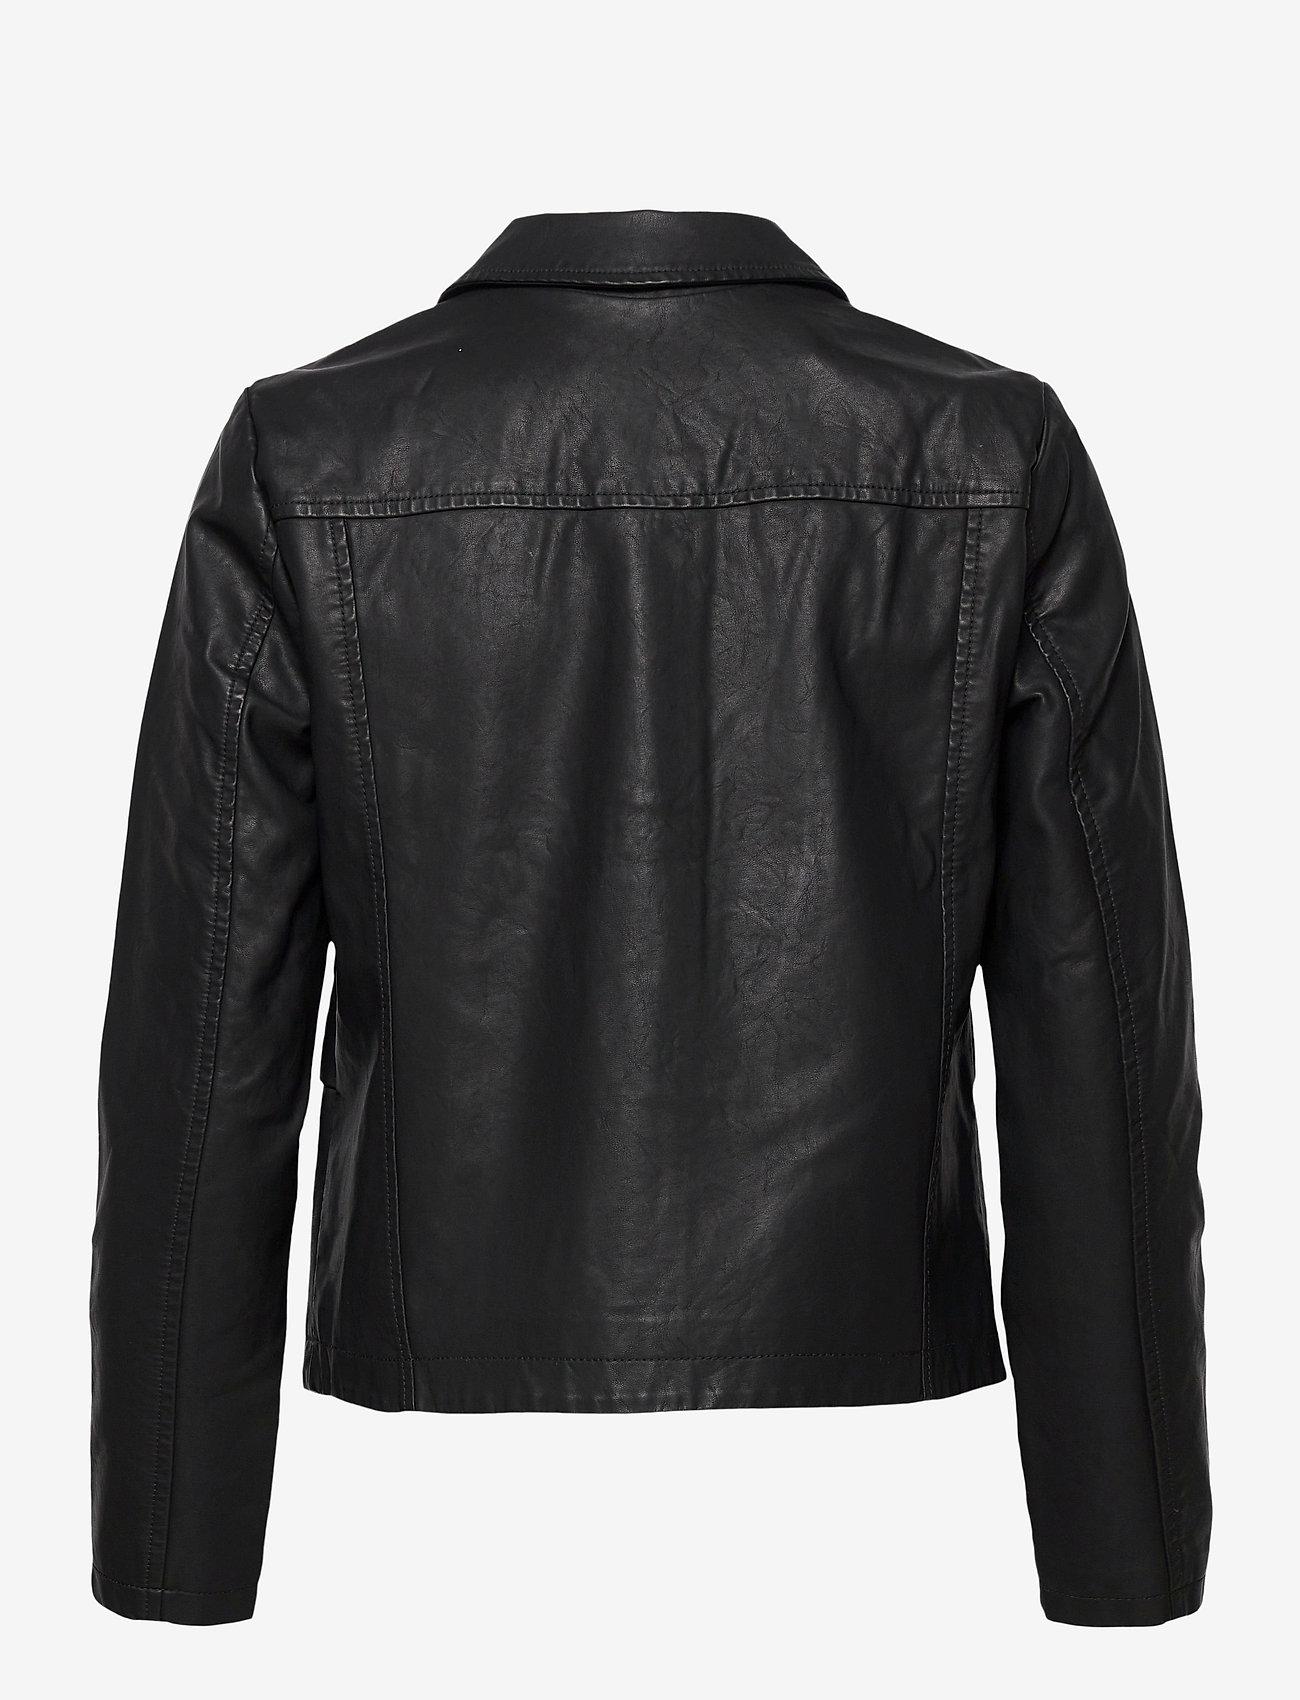 Soyaconcept - SC-GUNILLA - leather jackets - black - 1